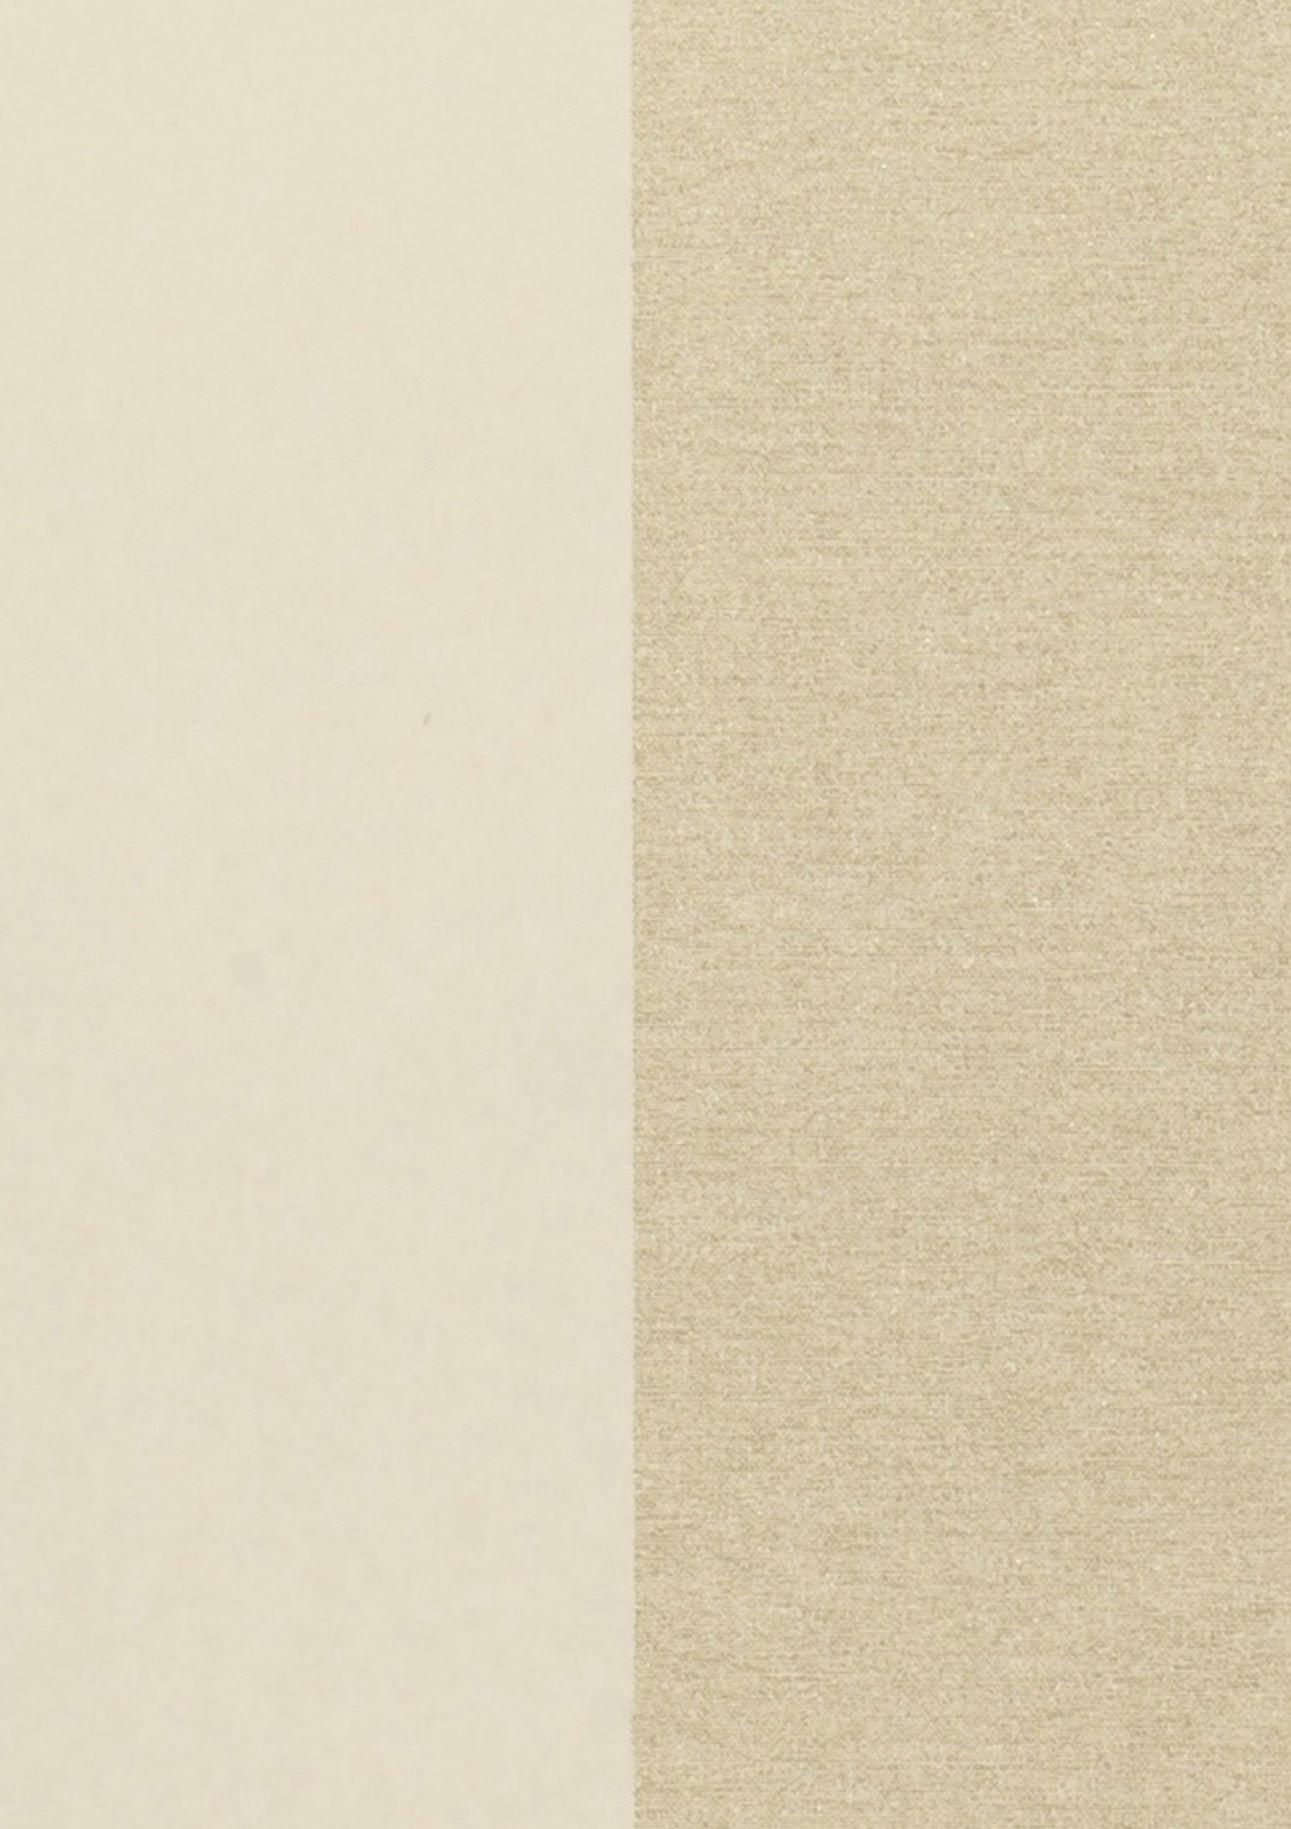 Carta da parati astale bianco crema oro tenue carta for Carta da parati anni 70 vendita on line